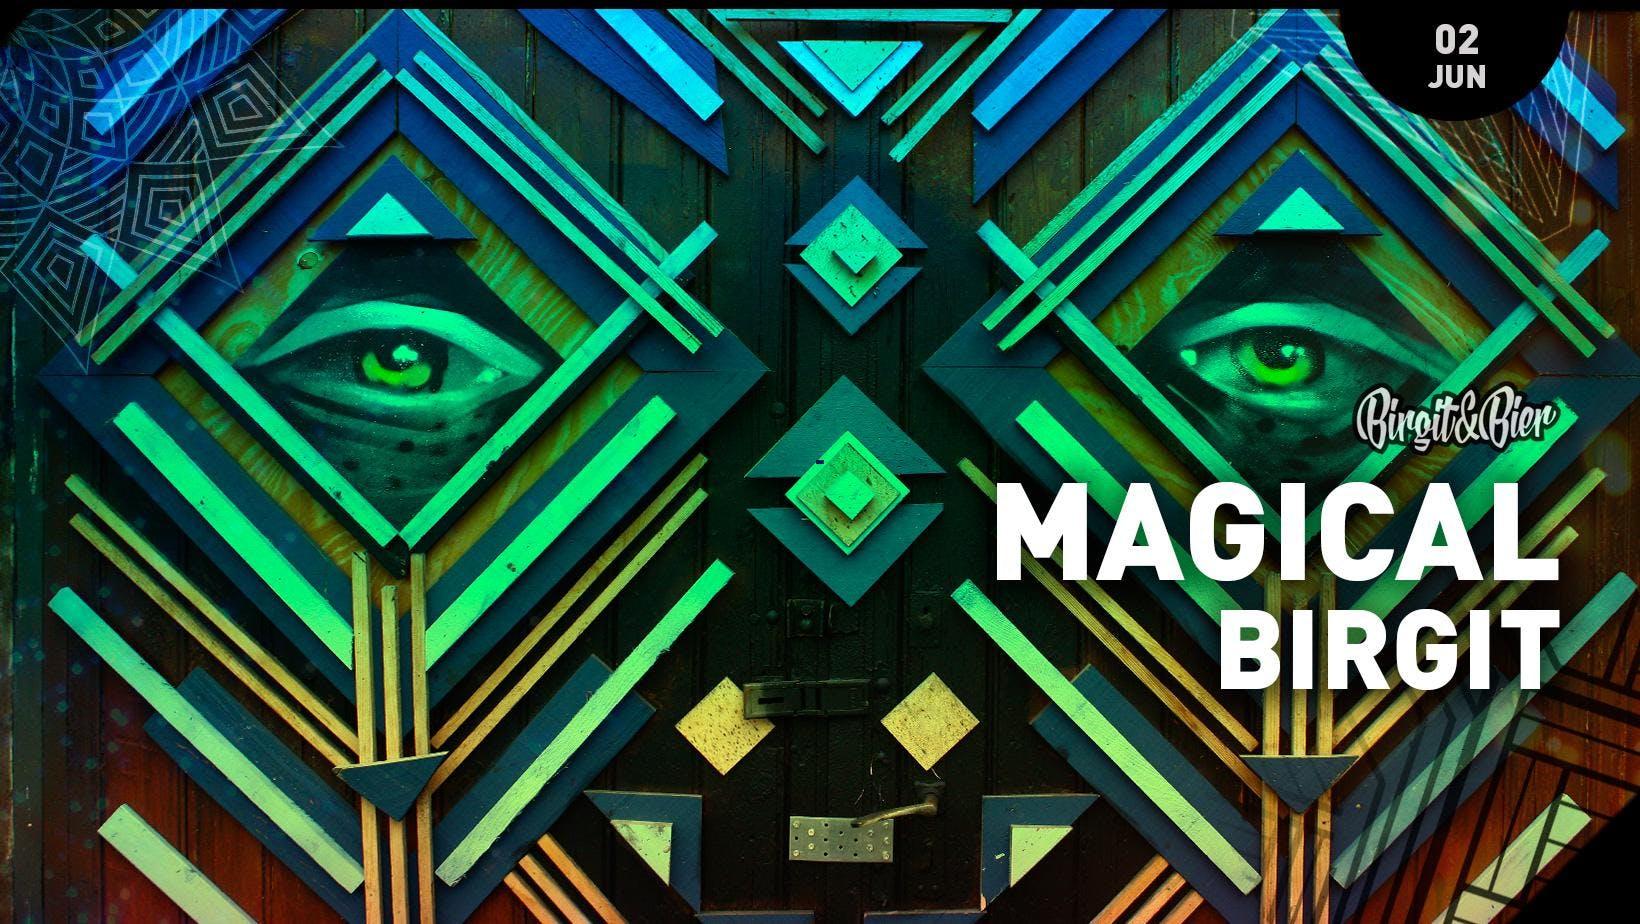 Magical Birgit